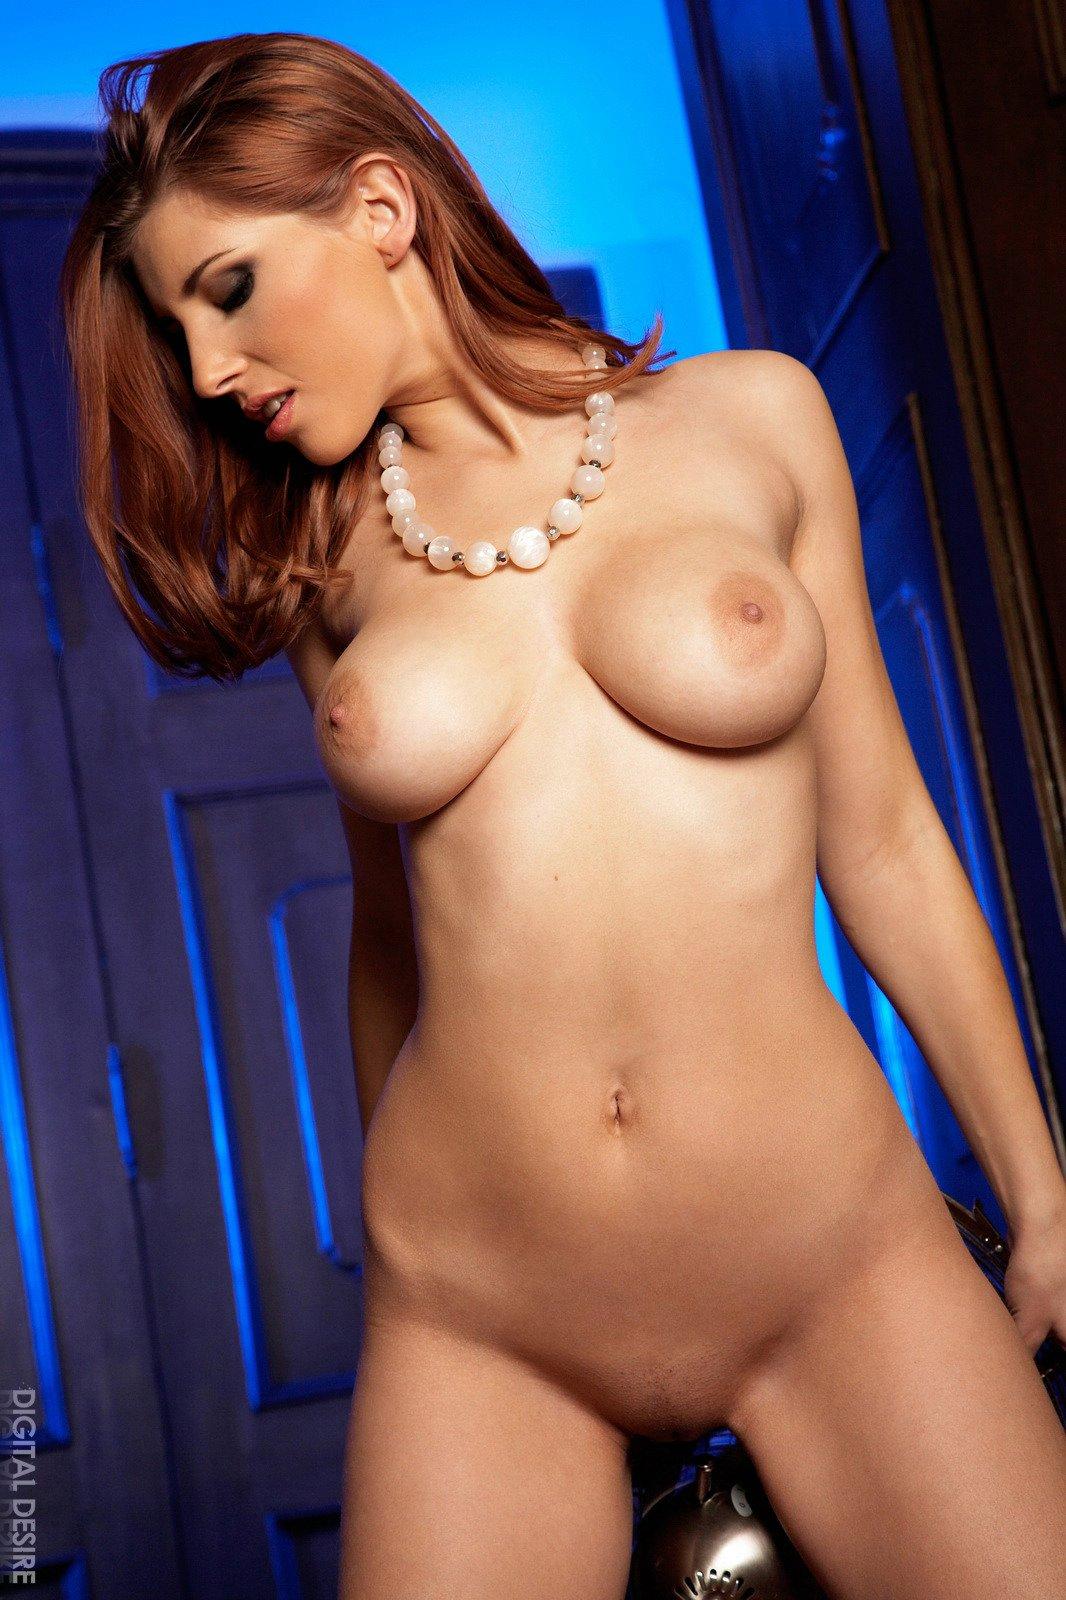 Busty redhead Simi exhibits her sexy body - My Pornstar Book